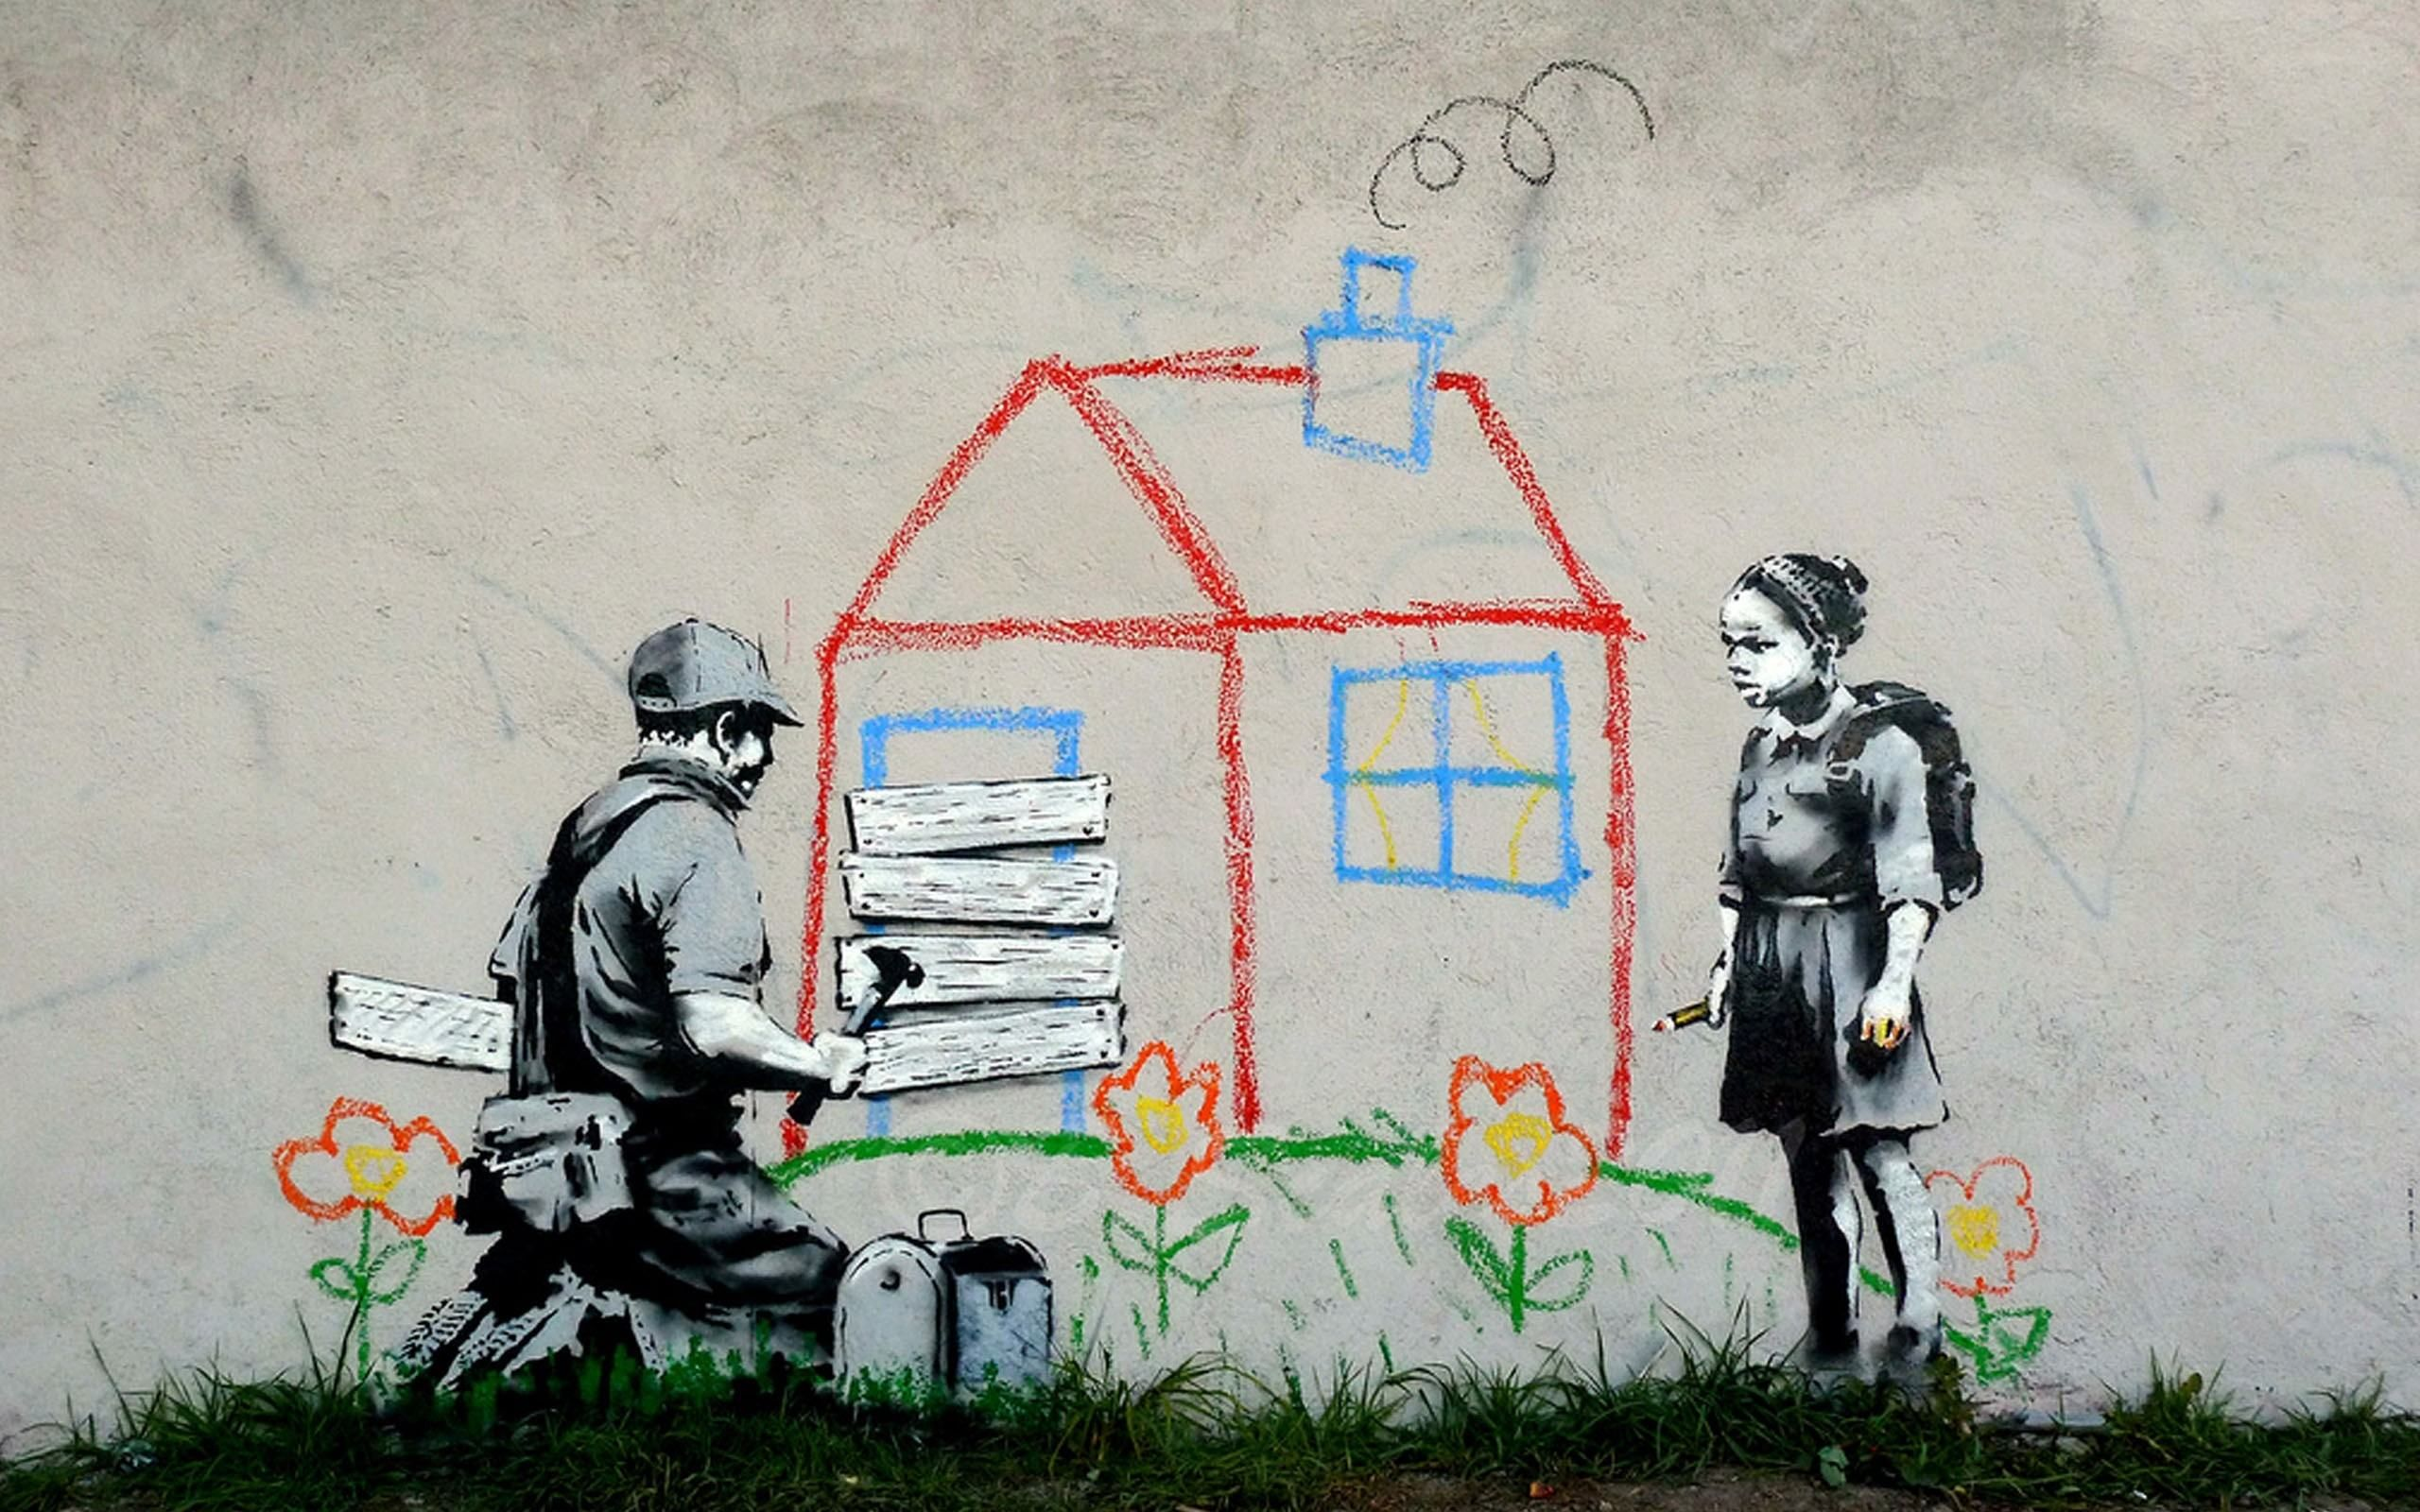 Kids houses peace banksy digital art fresh wallpaper hd for Digital mural wallpaper